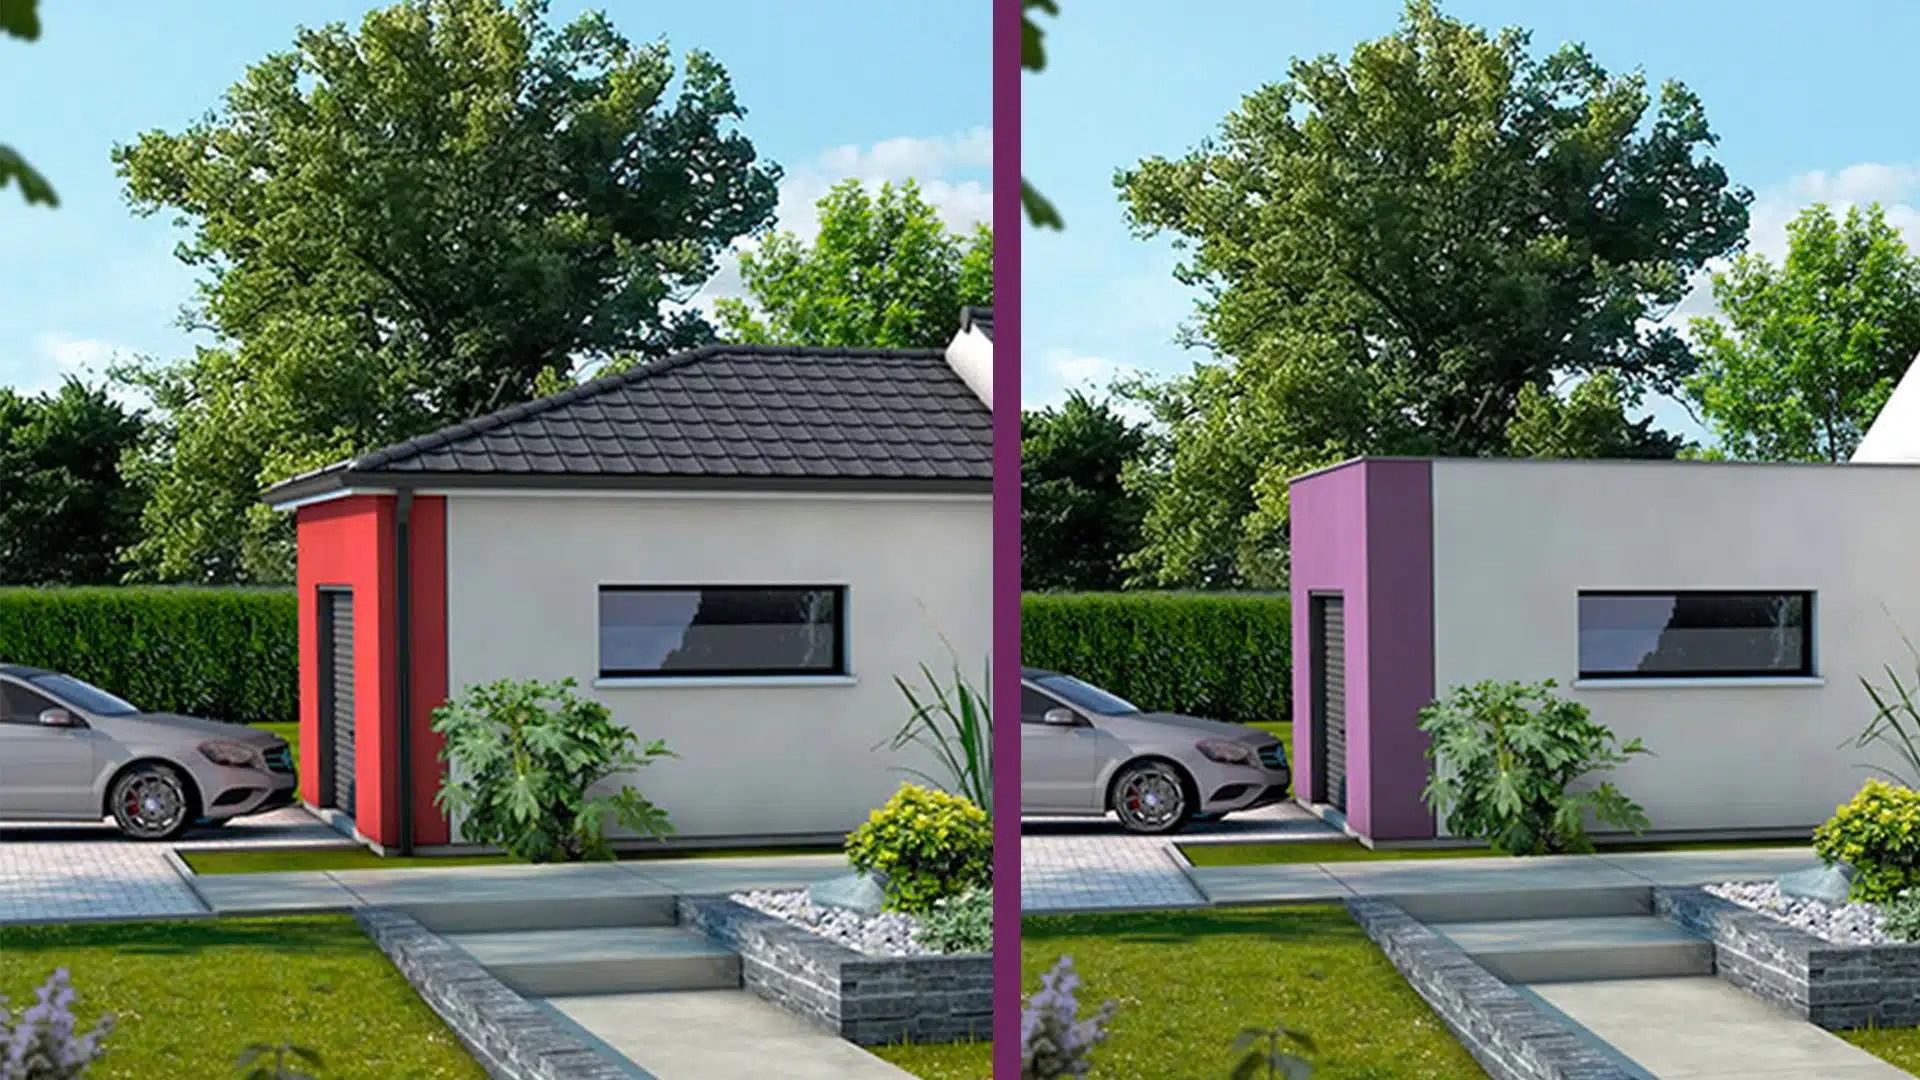 https://i2.wp.com/www.maisonsclairlogis.fr/wp-content/uploads/garage-toit.jpg?fit=1920%2C1080&ssl=1